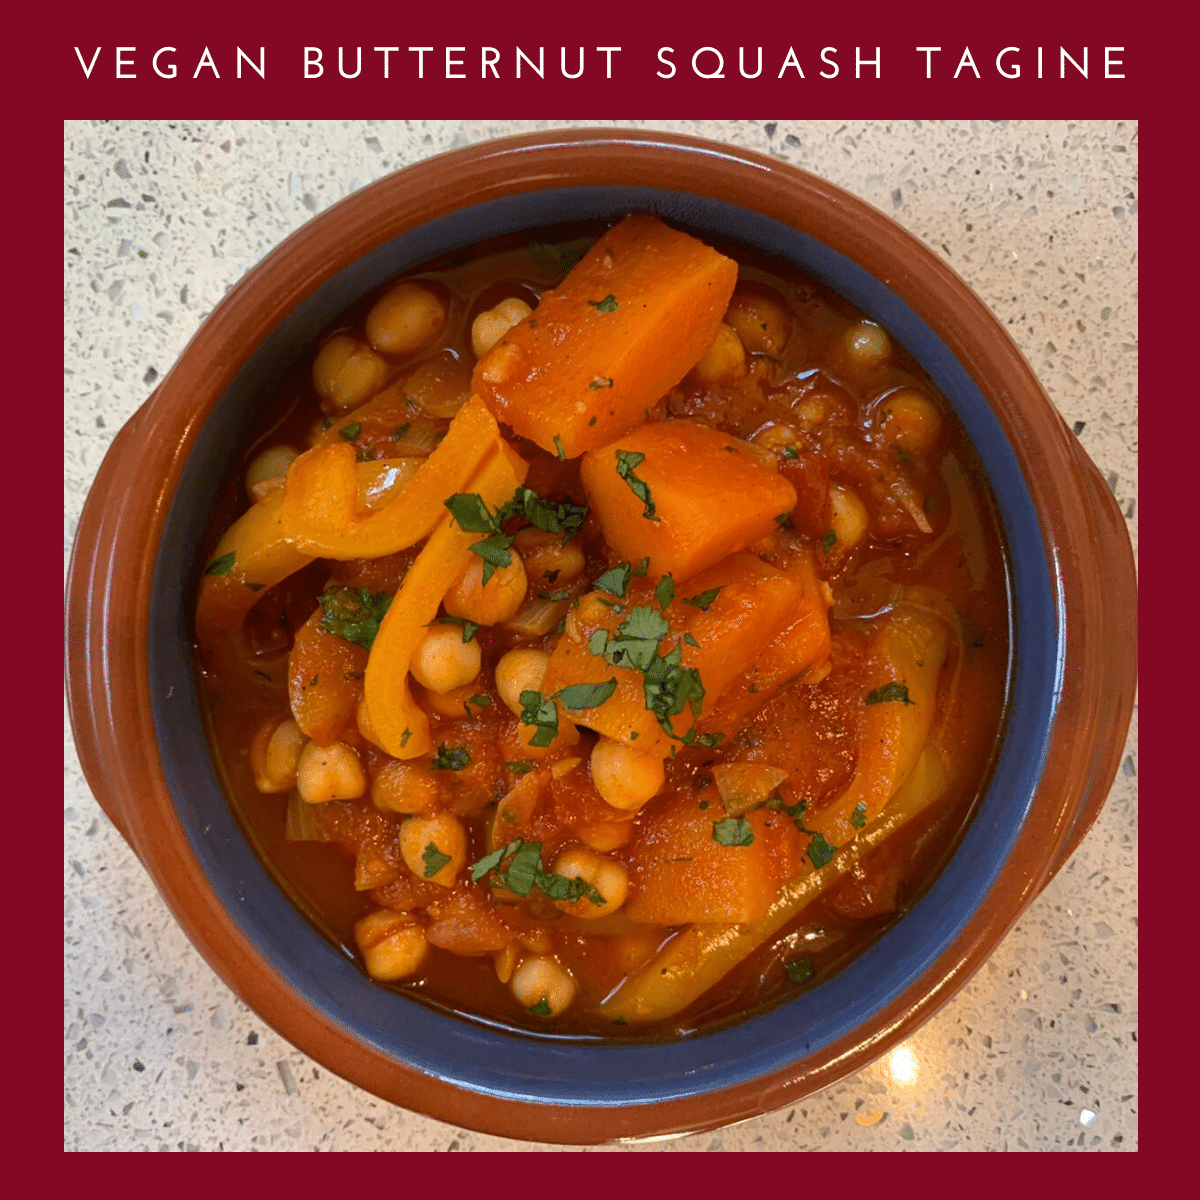 Vegan Butternut Squash Tagine Recipe | Veganuary Recipes